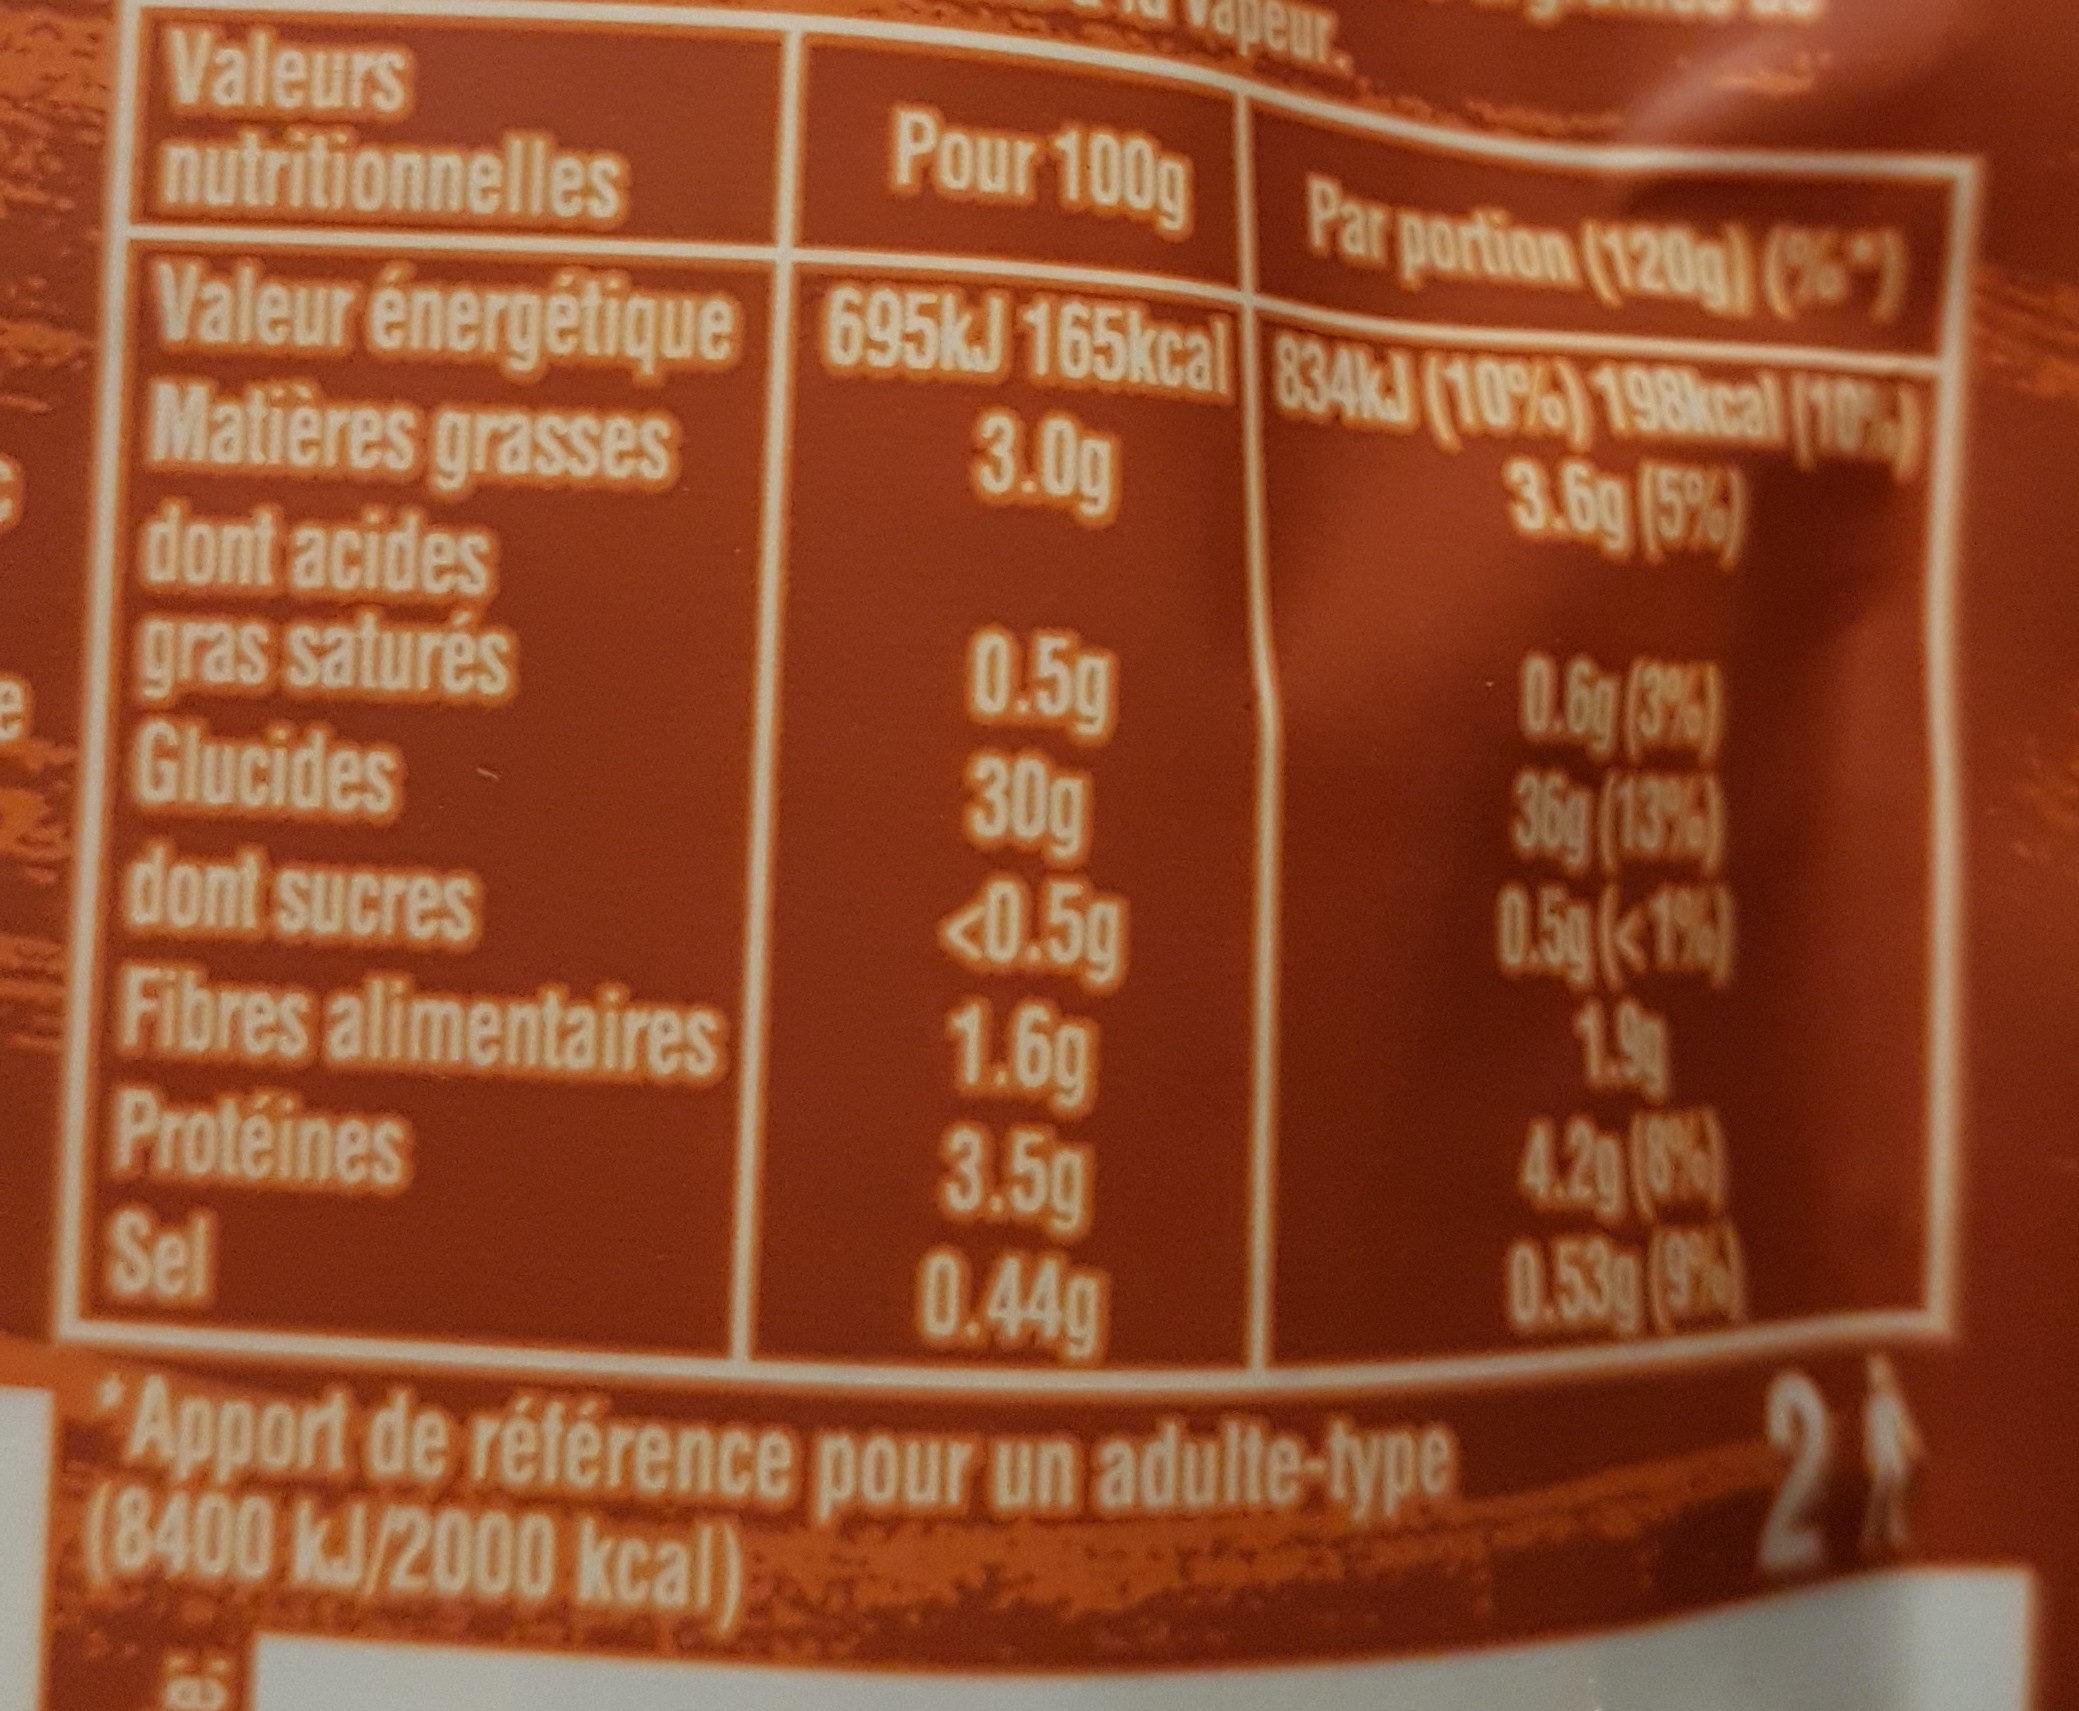 Duo de Riz, Quinoa & Graines de Lin - Informations nutritionnelles